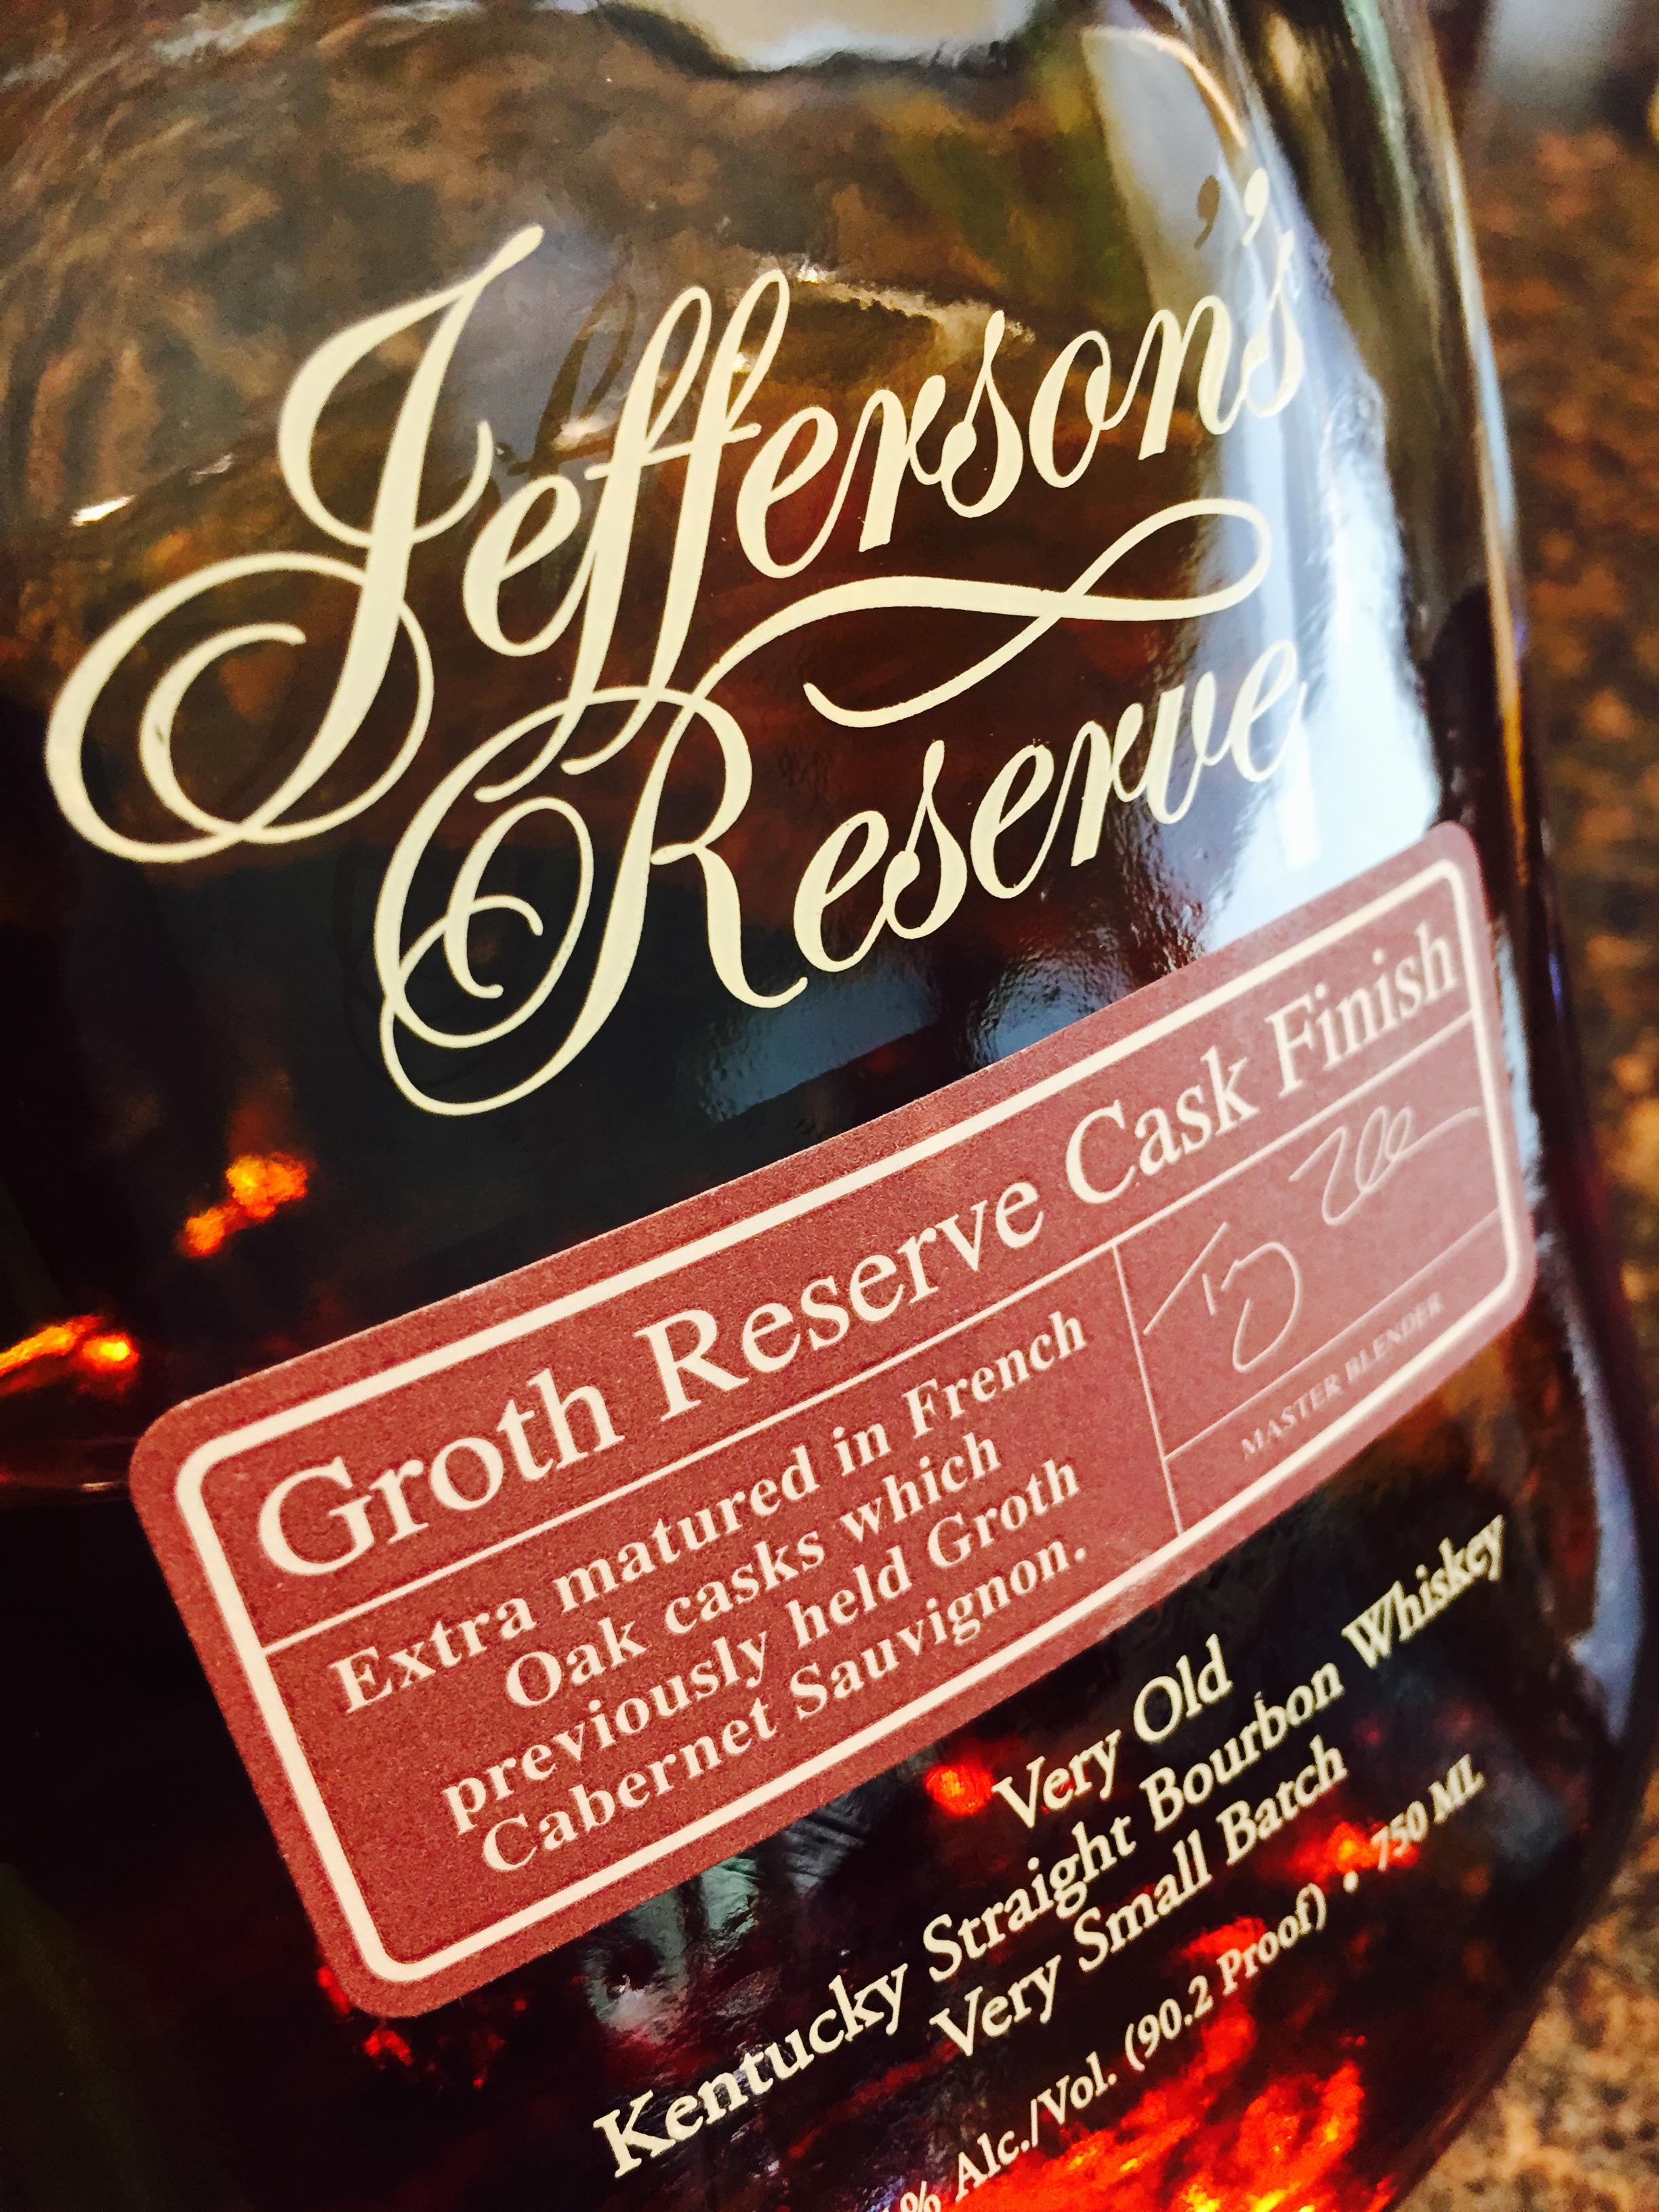 Jefferson's Reserve Groth Cask